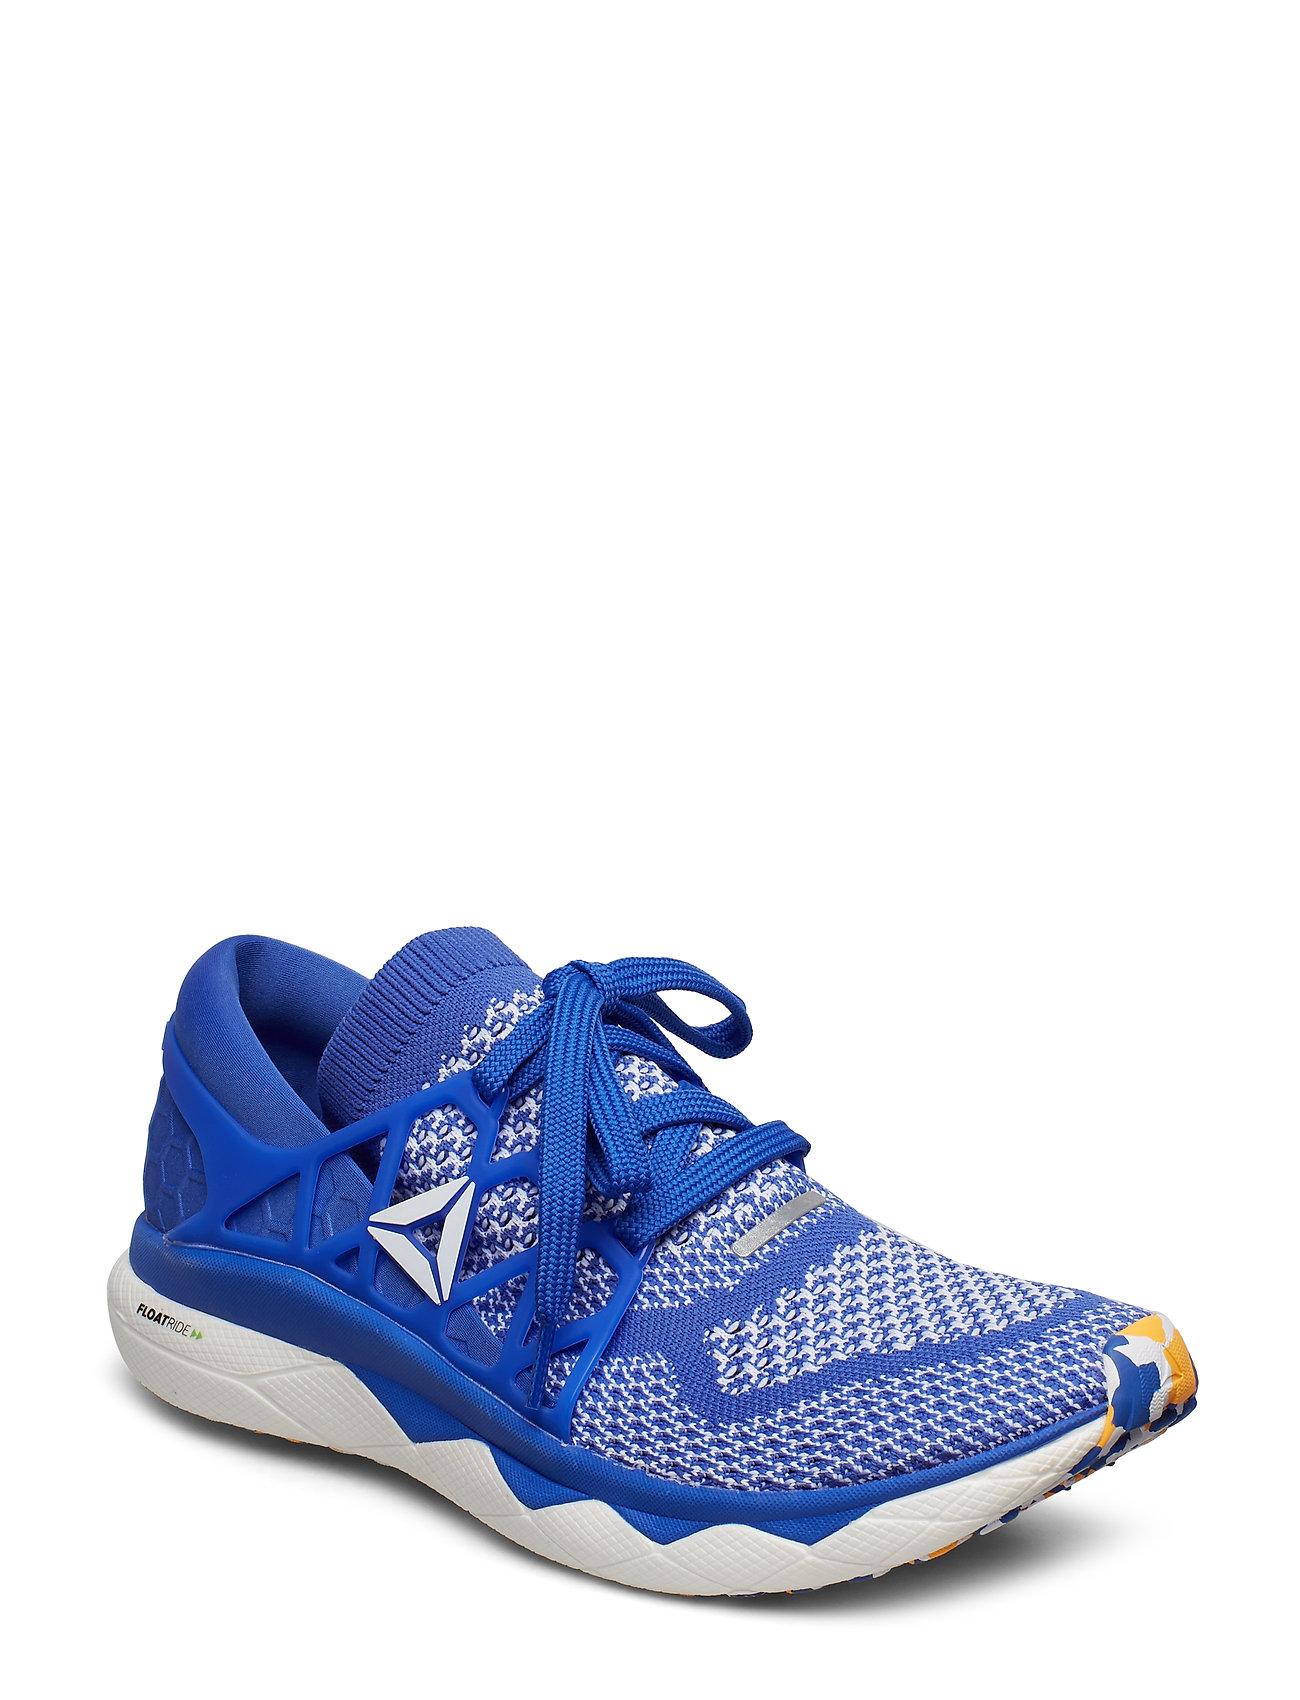 REEBOK Reebok Floatride Run Ultk Shoes Sport Shoes Running Shoes Blau REEBOK PERFORMANCE